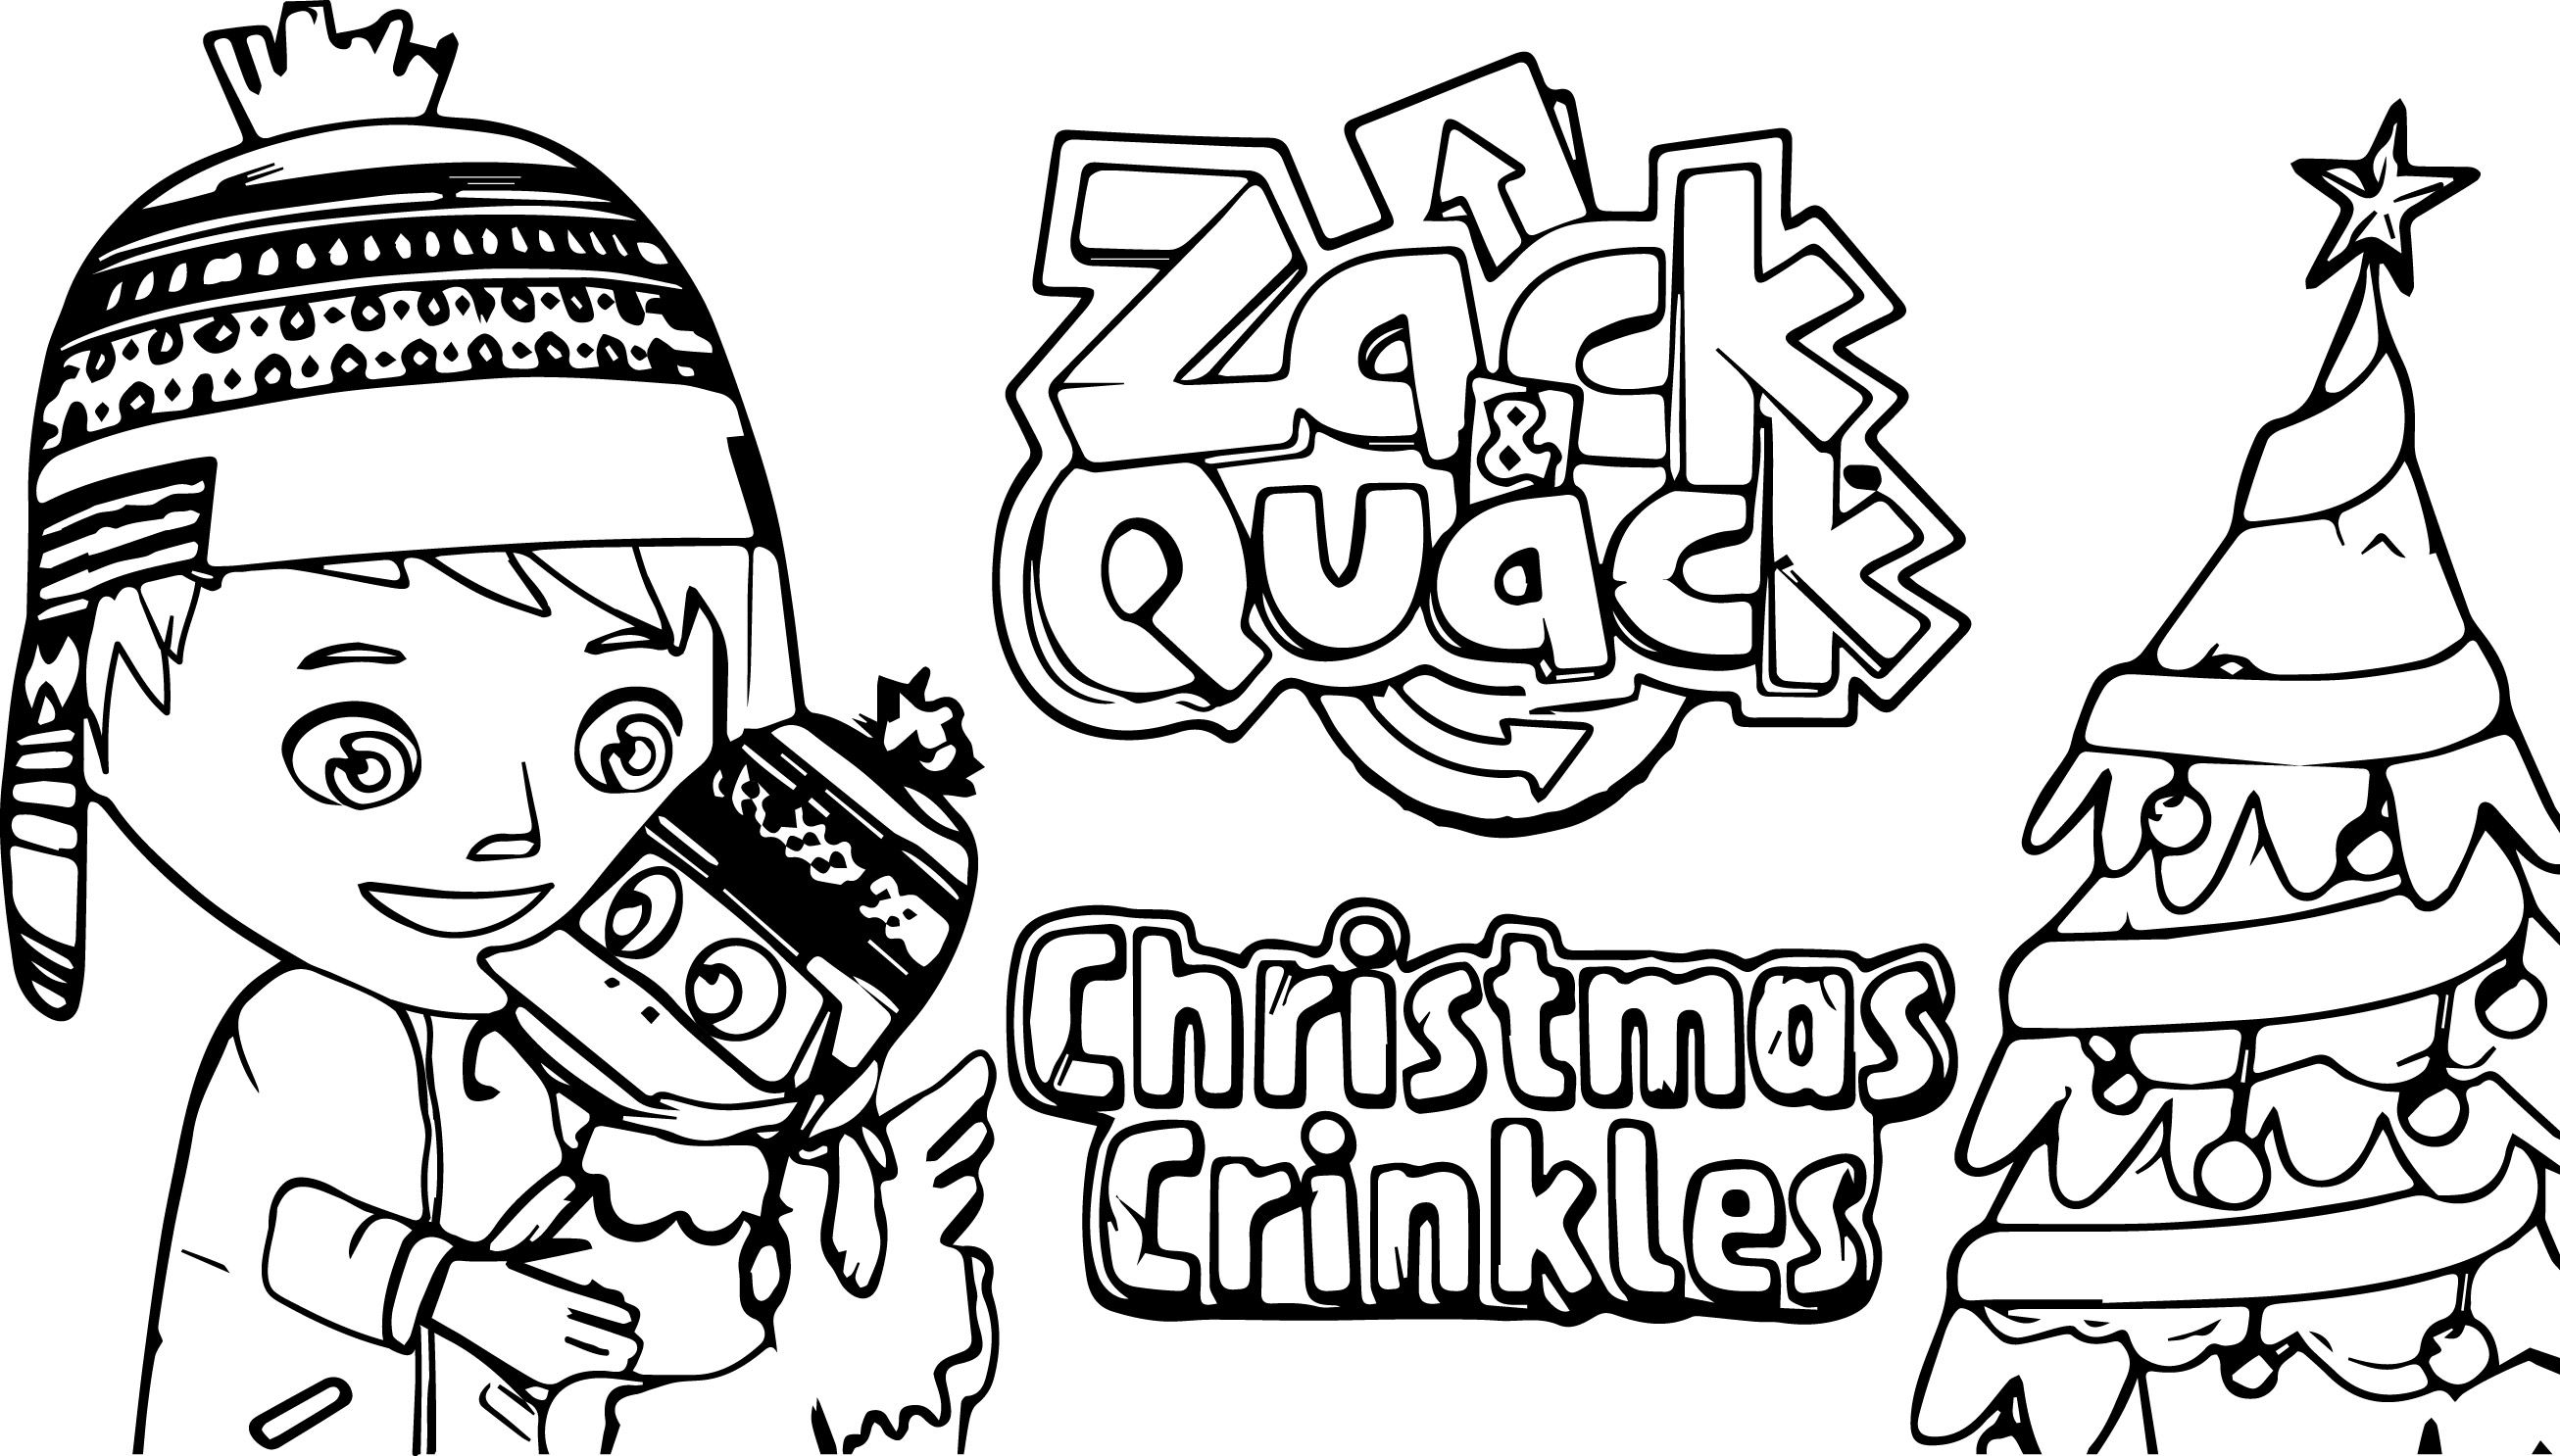 Coloring Pages Zack And Quack Drawing Quack di Zack Quack coloring ...